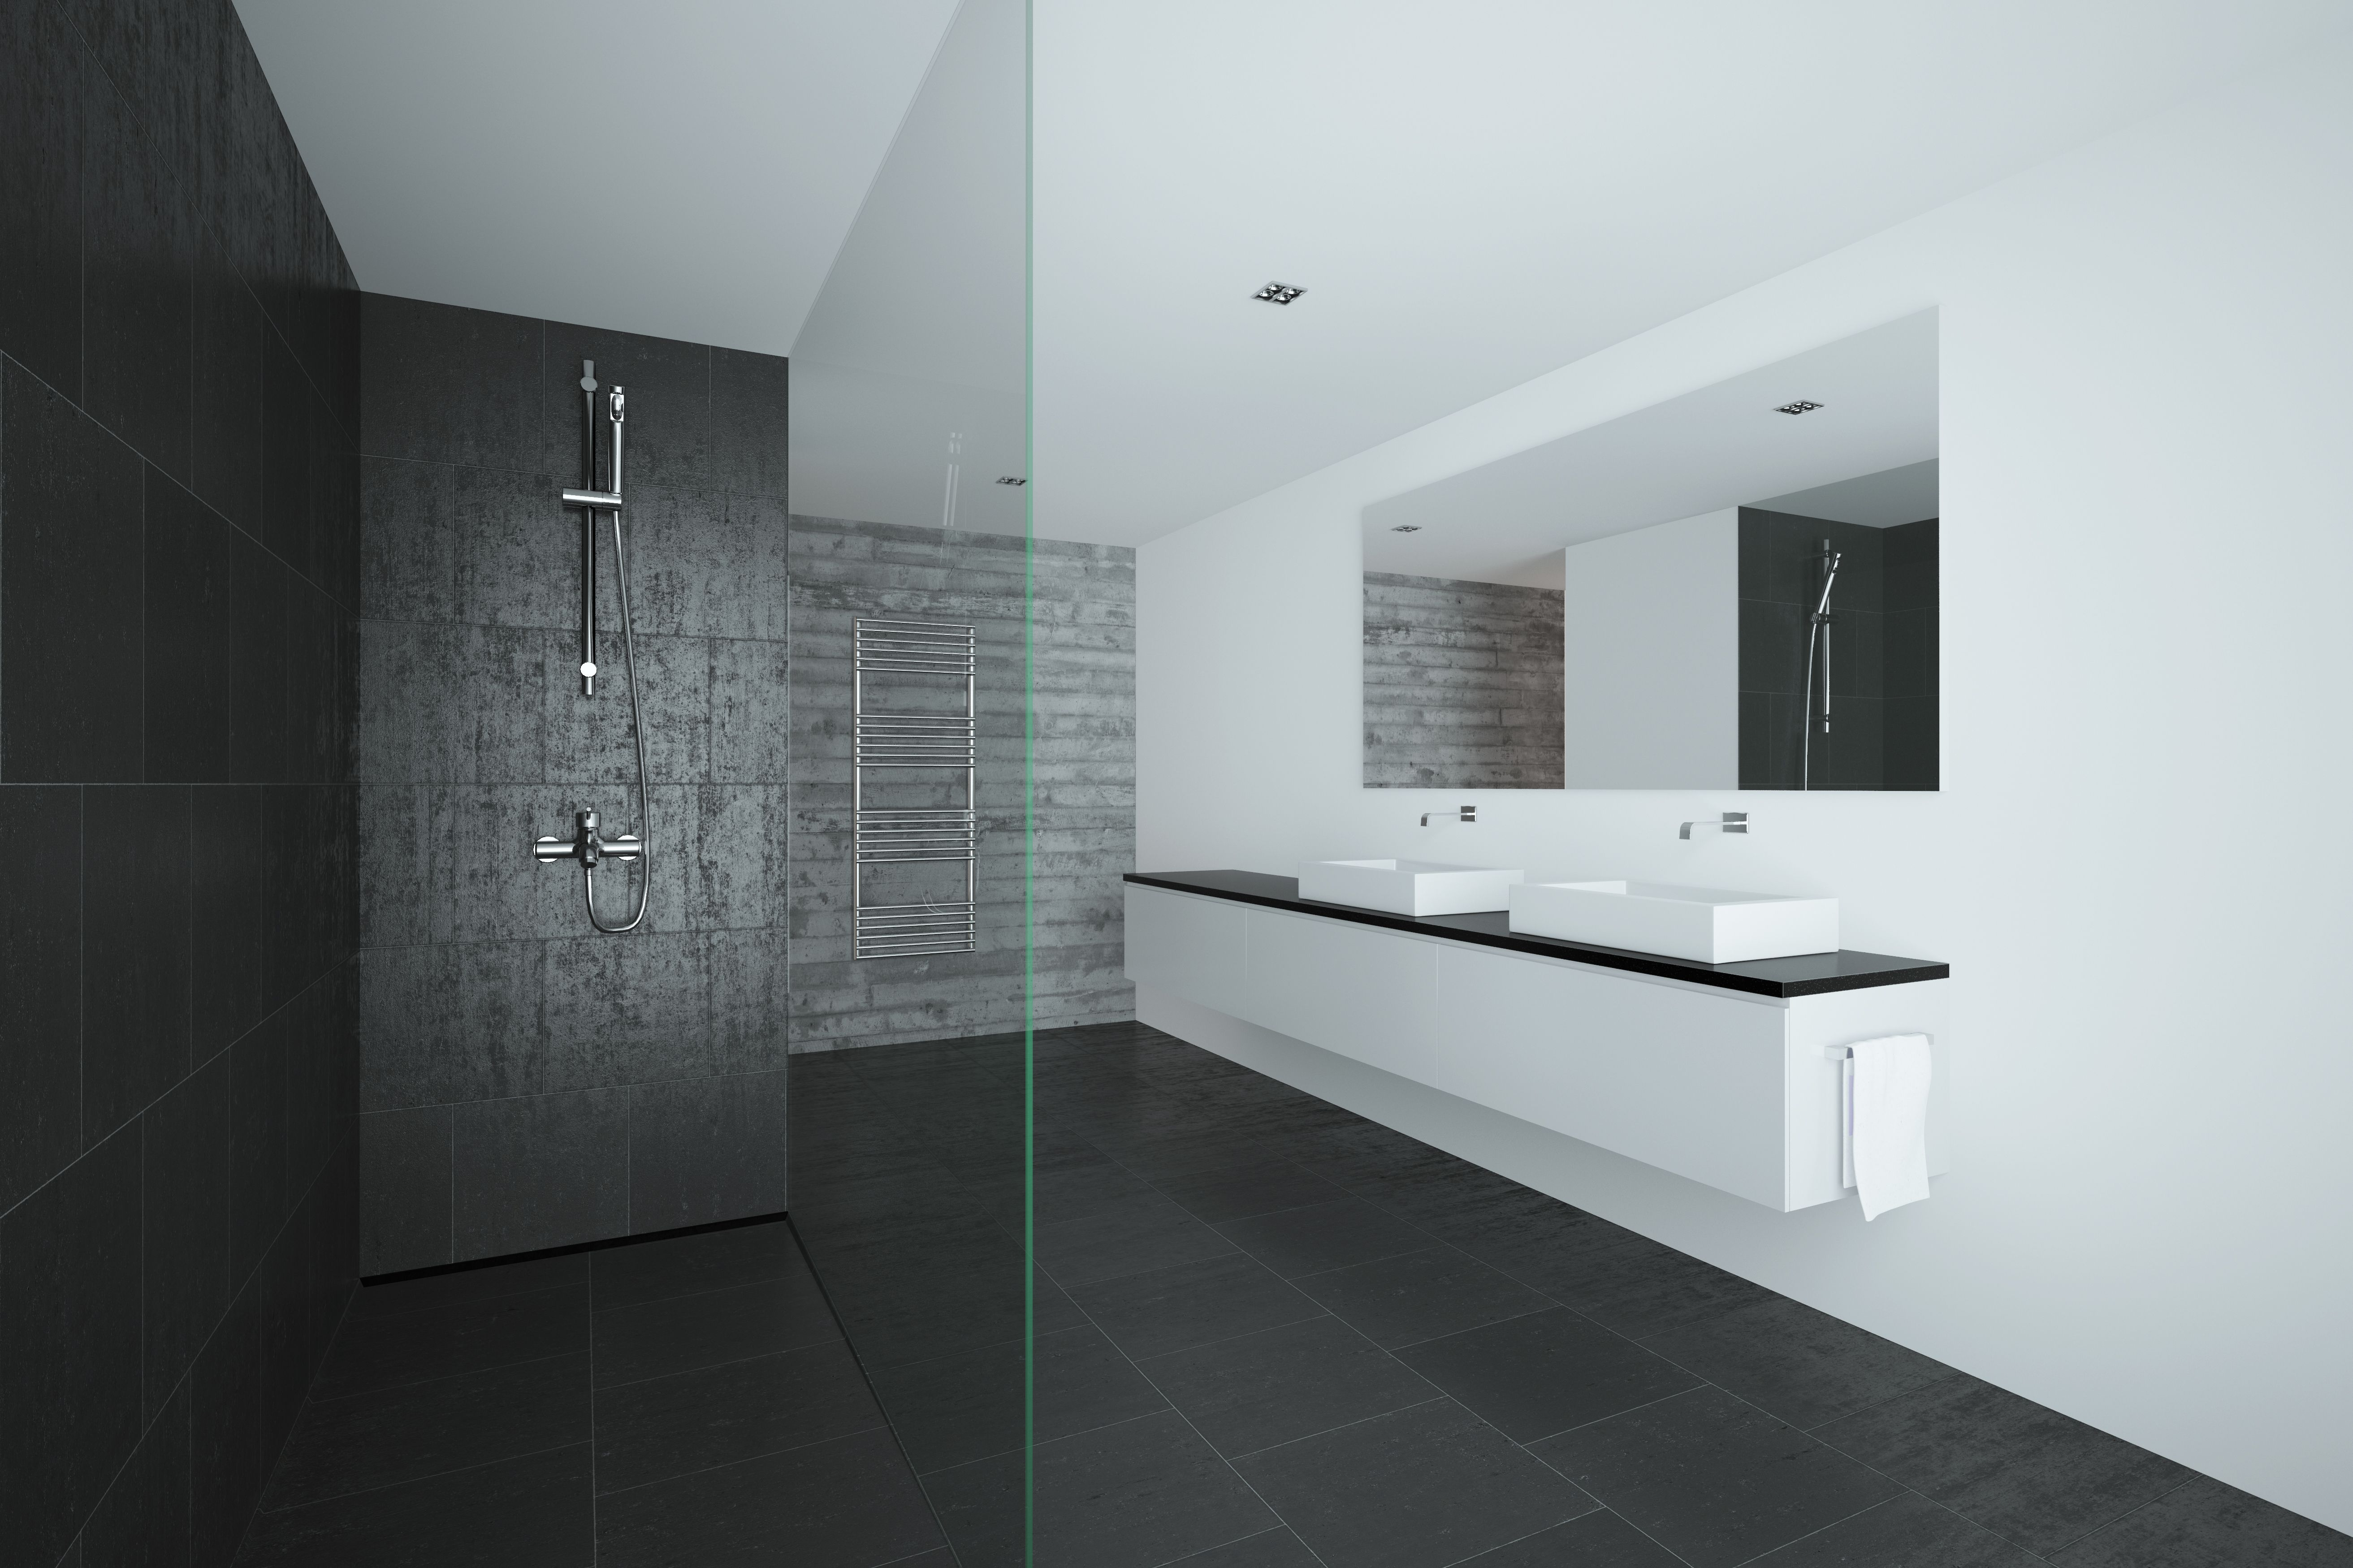 Vanity Bathroom Wall And Floor Tiles